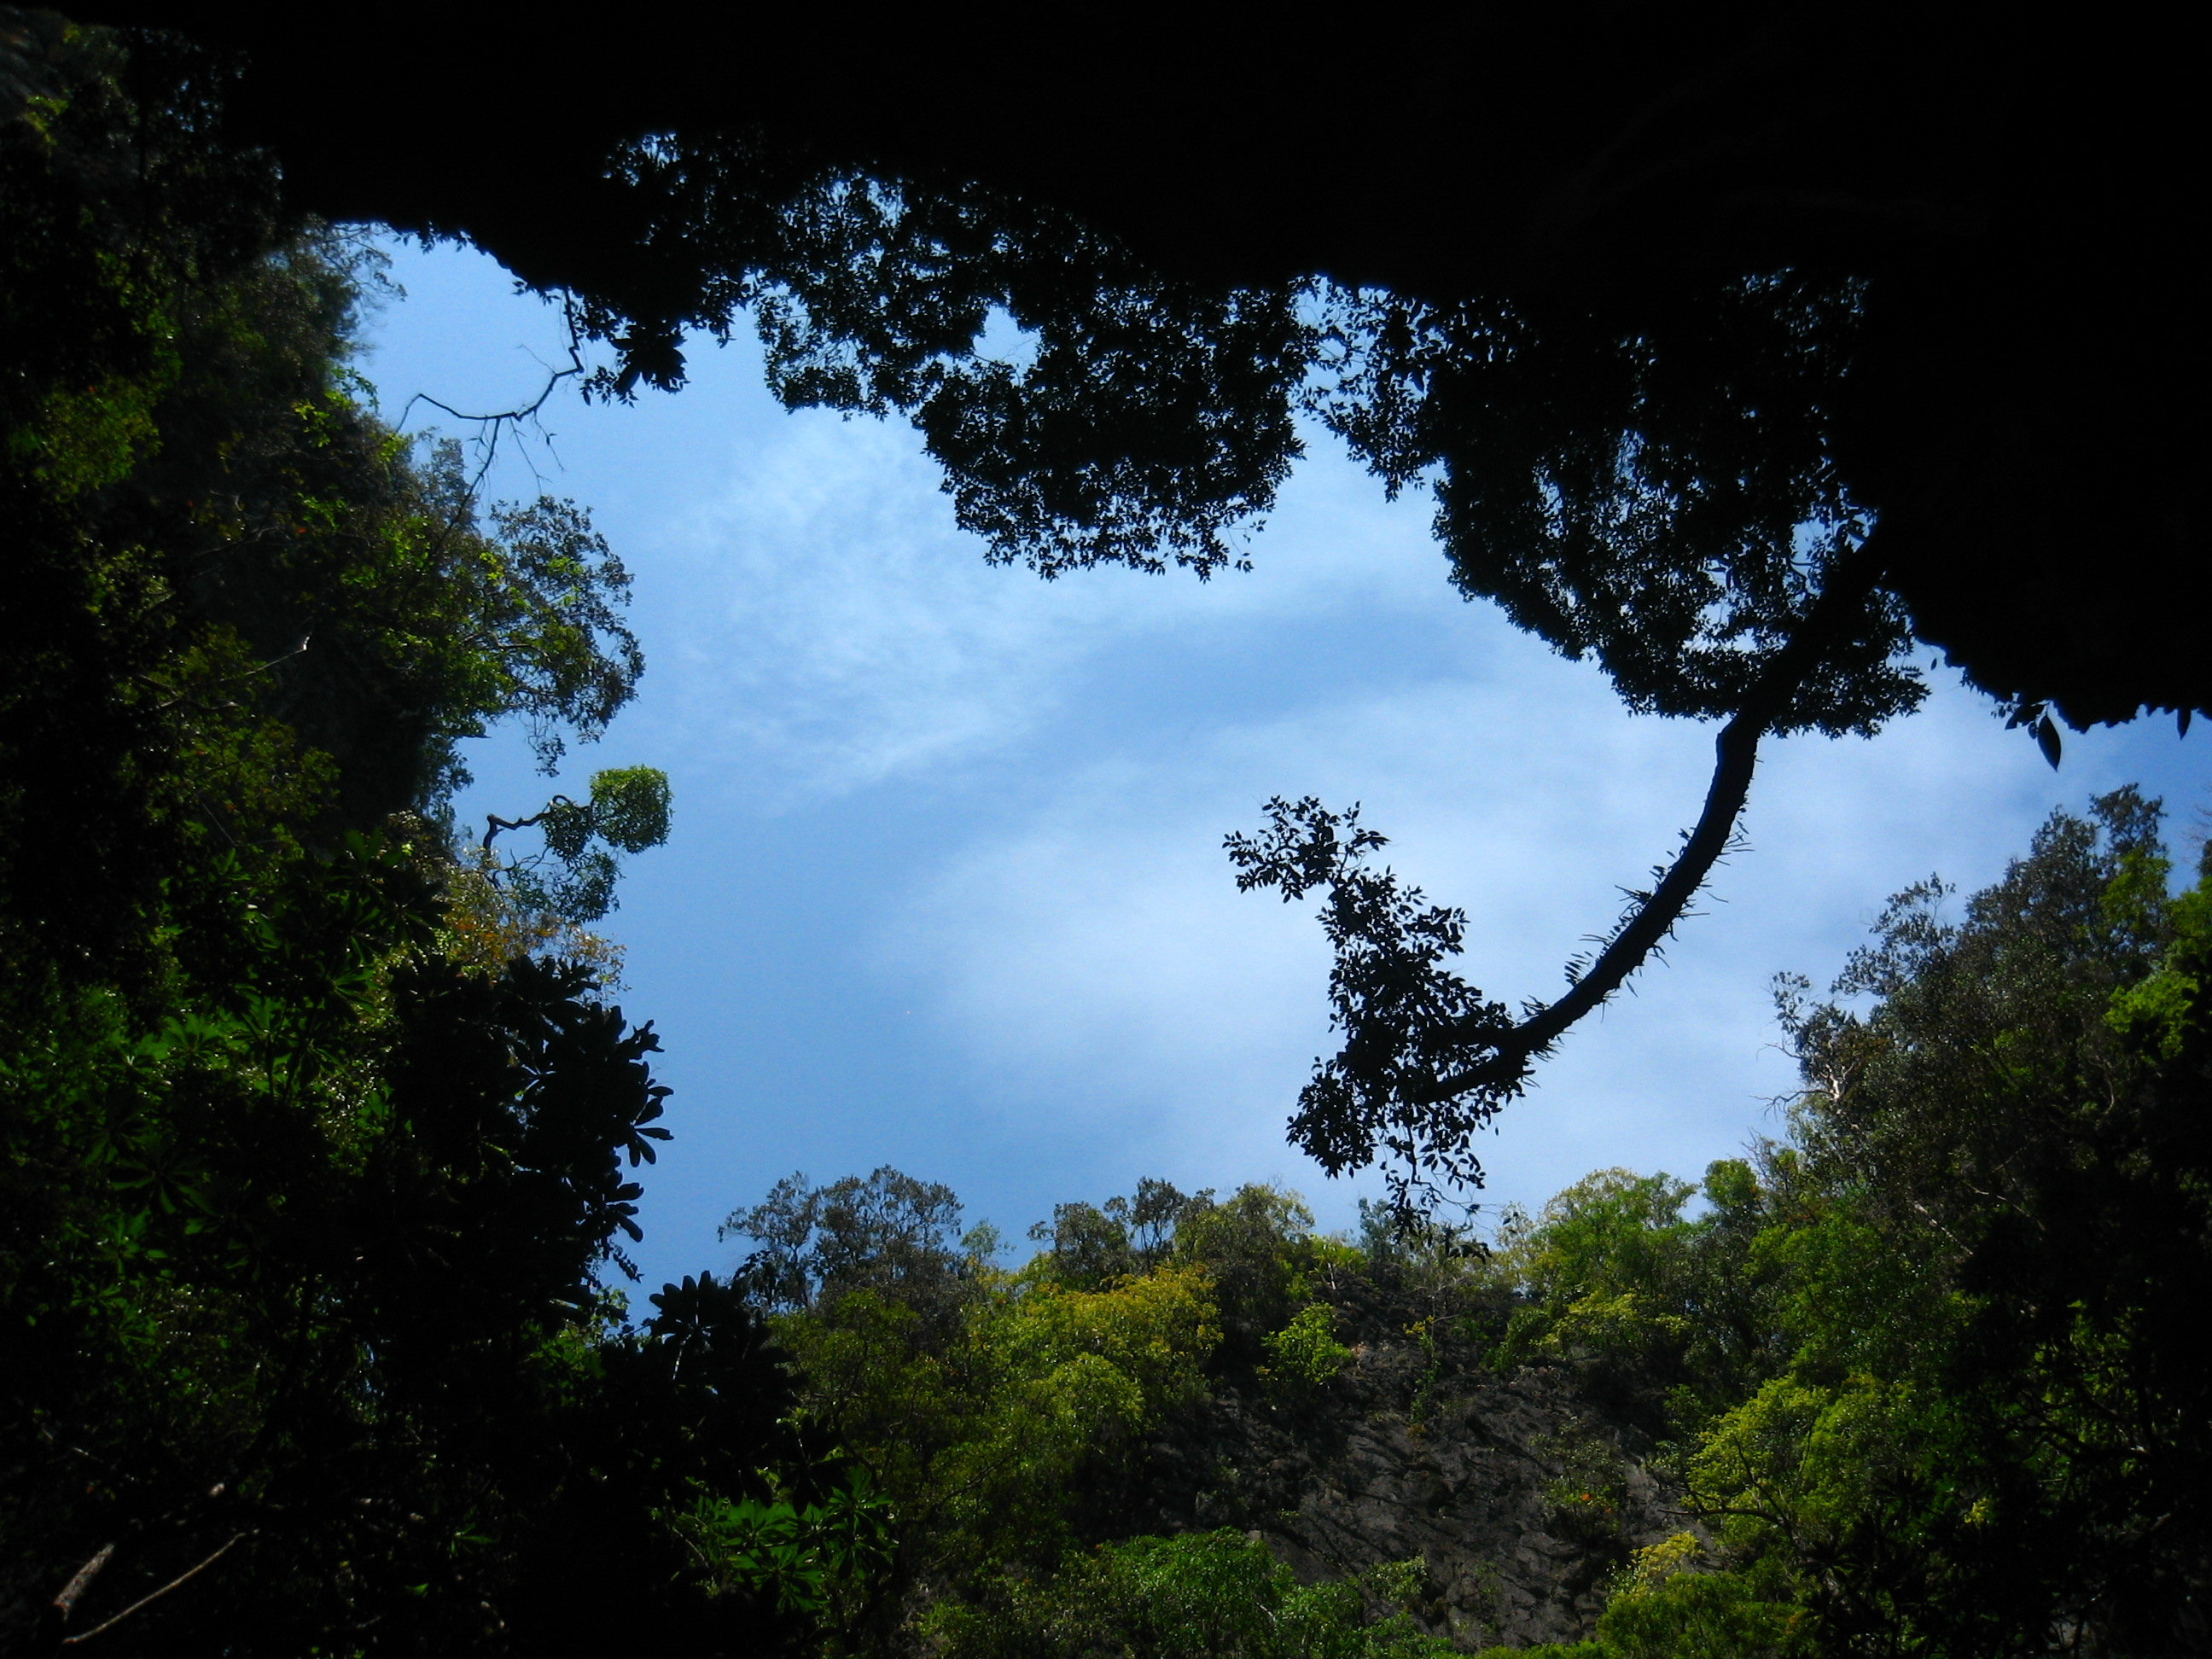 Inside the island